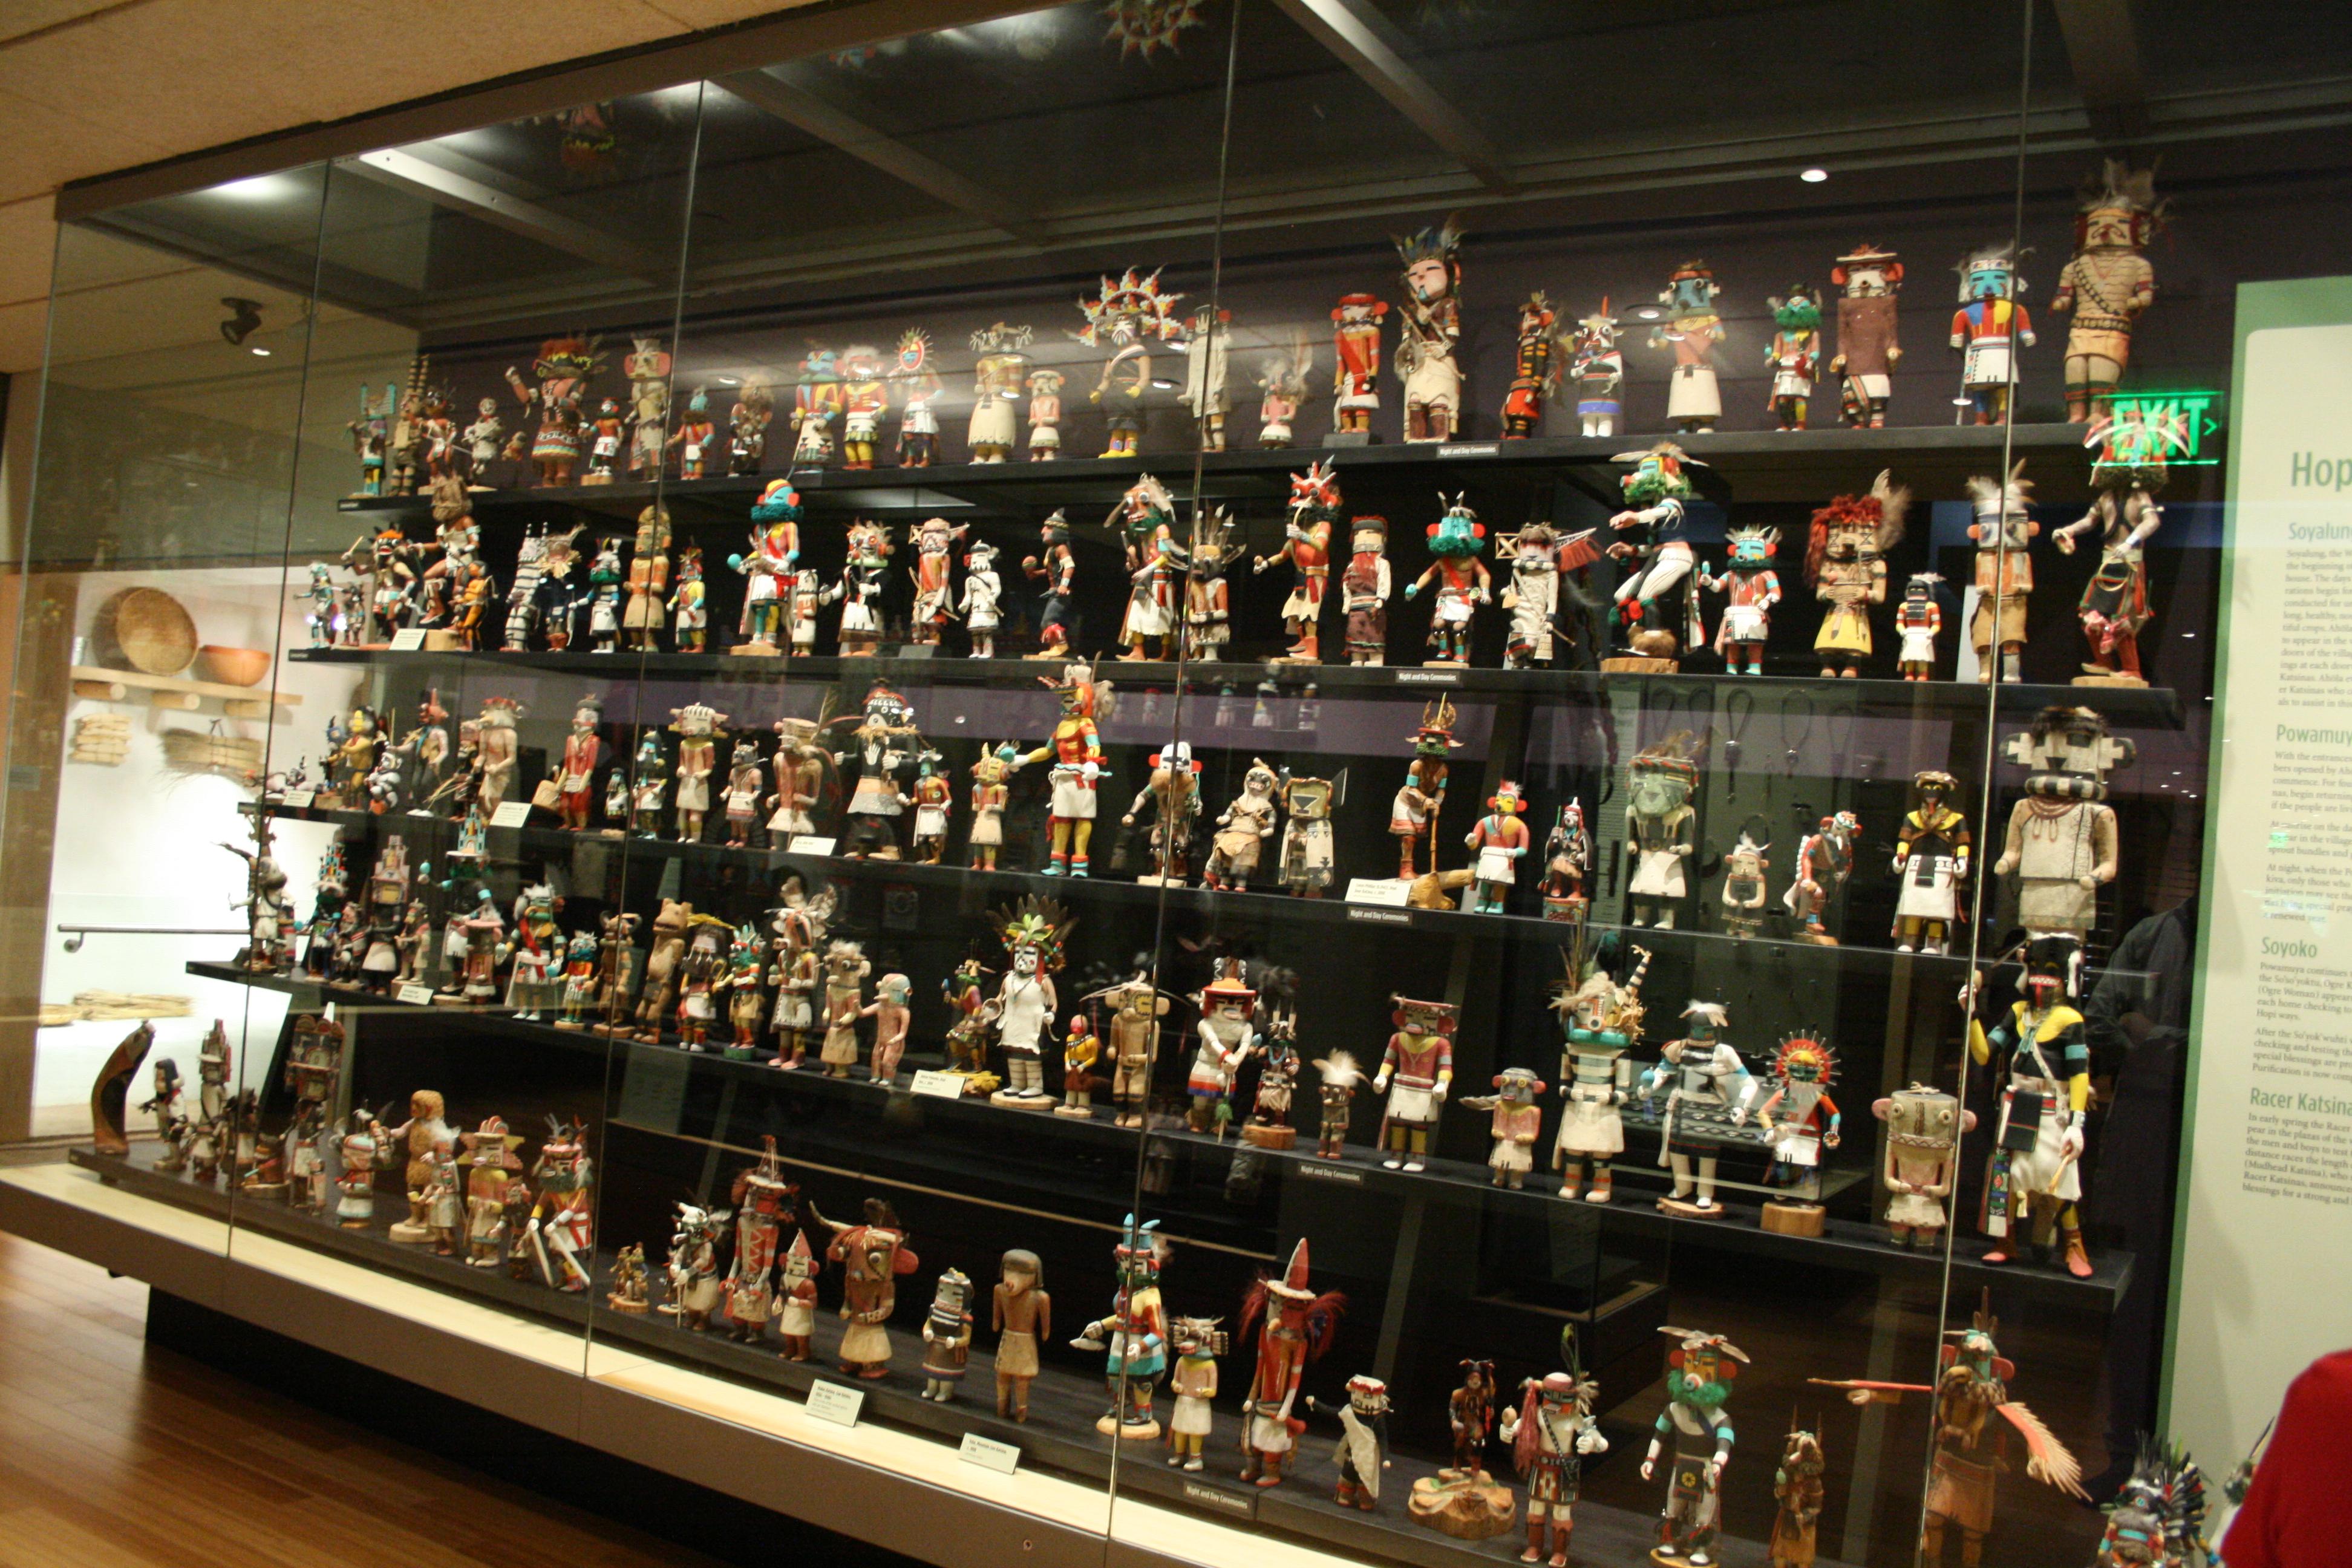 a dolls exhibit screening viewing